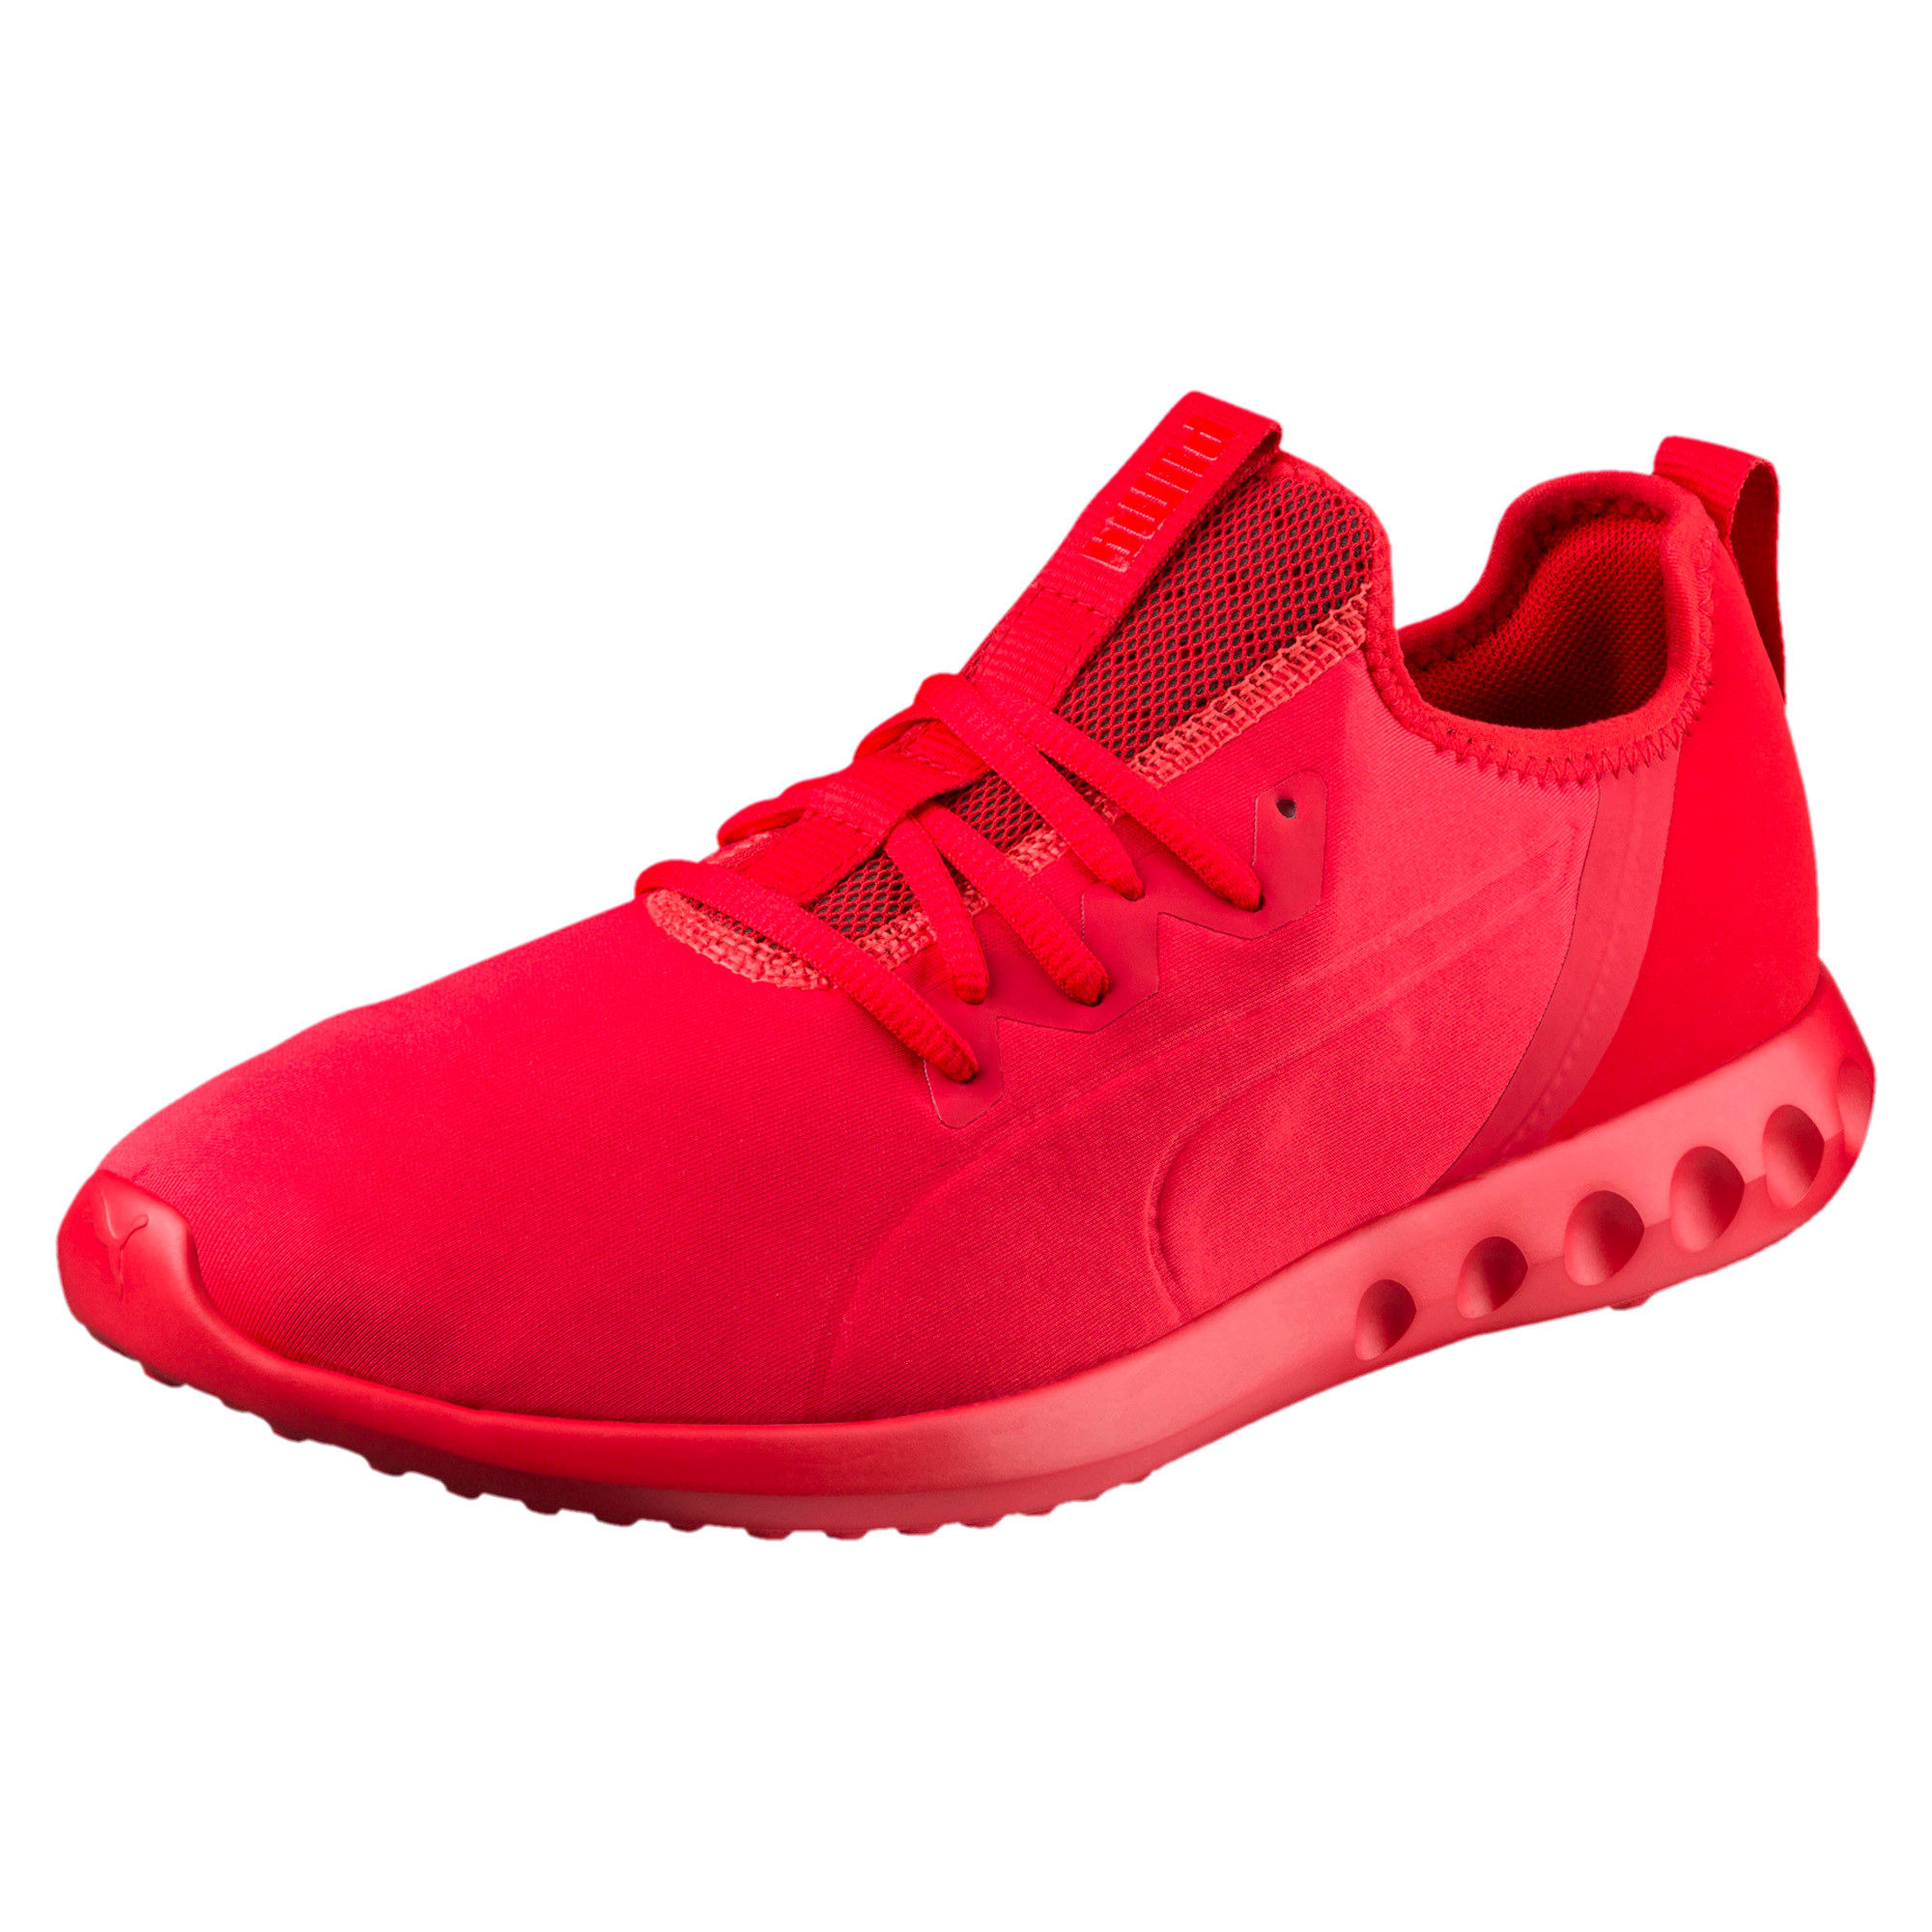 Thumbnail 1 of Carson 2 X Men's Running Shoes, High Risk Red, medium